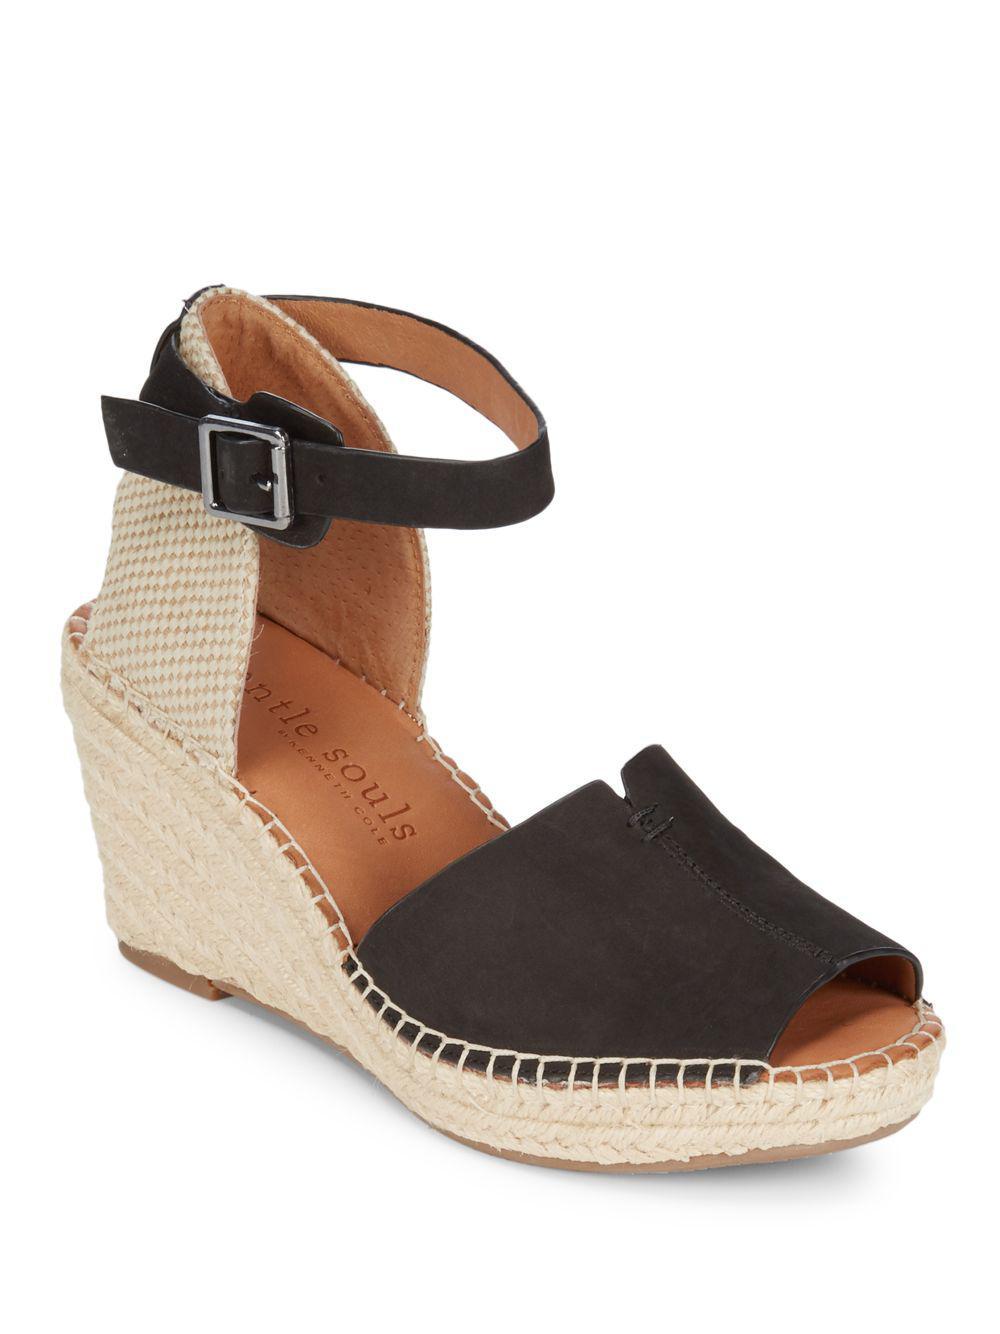 efe6d547feee09 Lyst - Gentle Souls Charli Leather Espadrille Wedge Sandals in Black